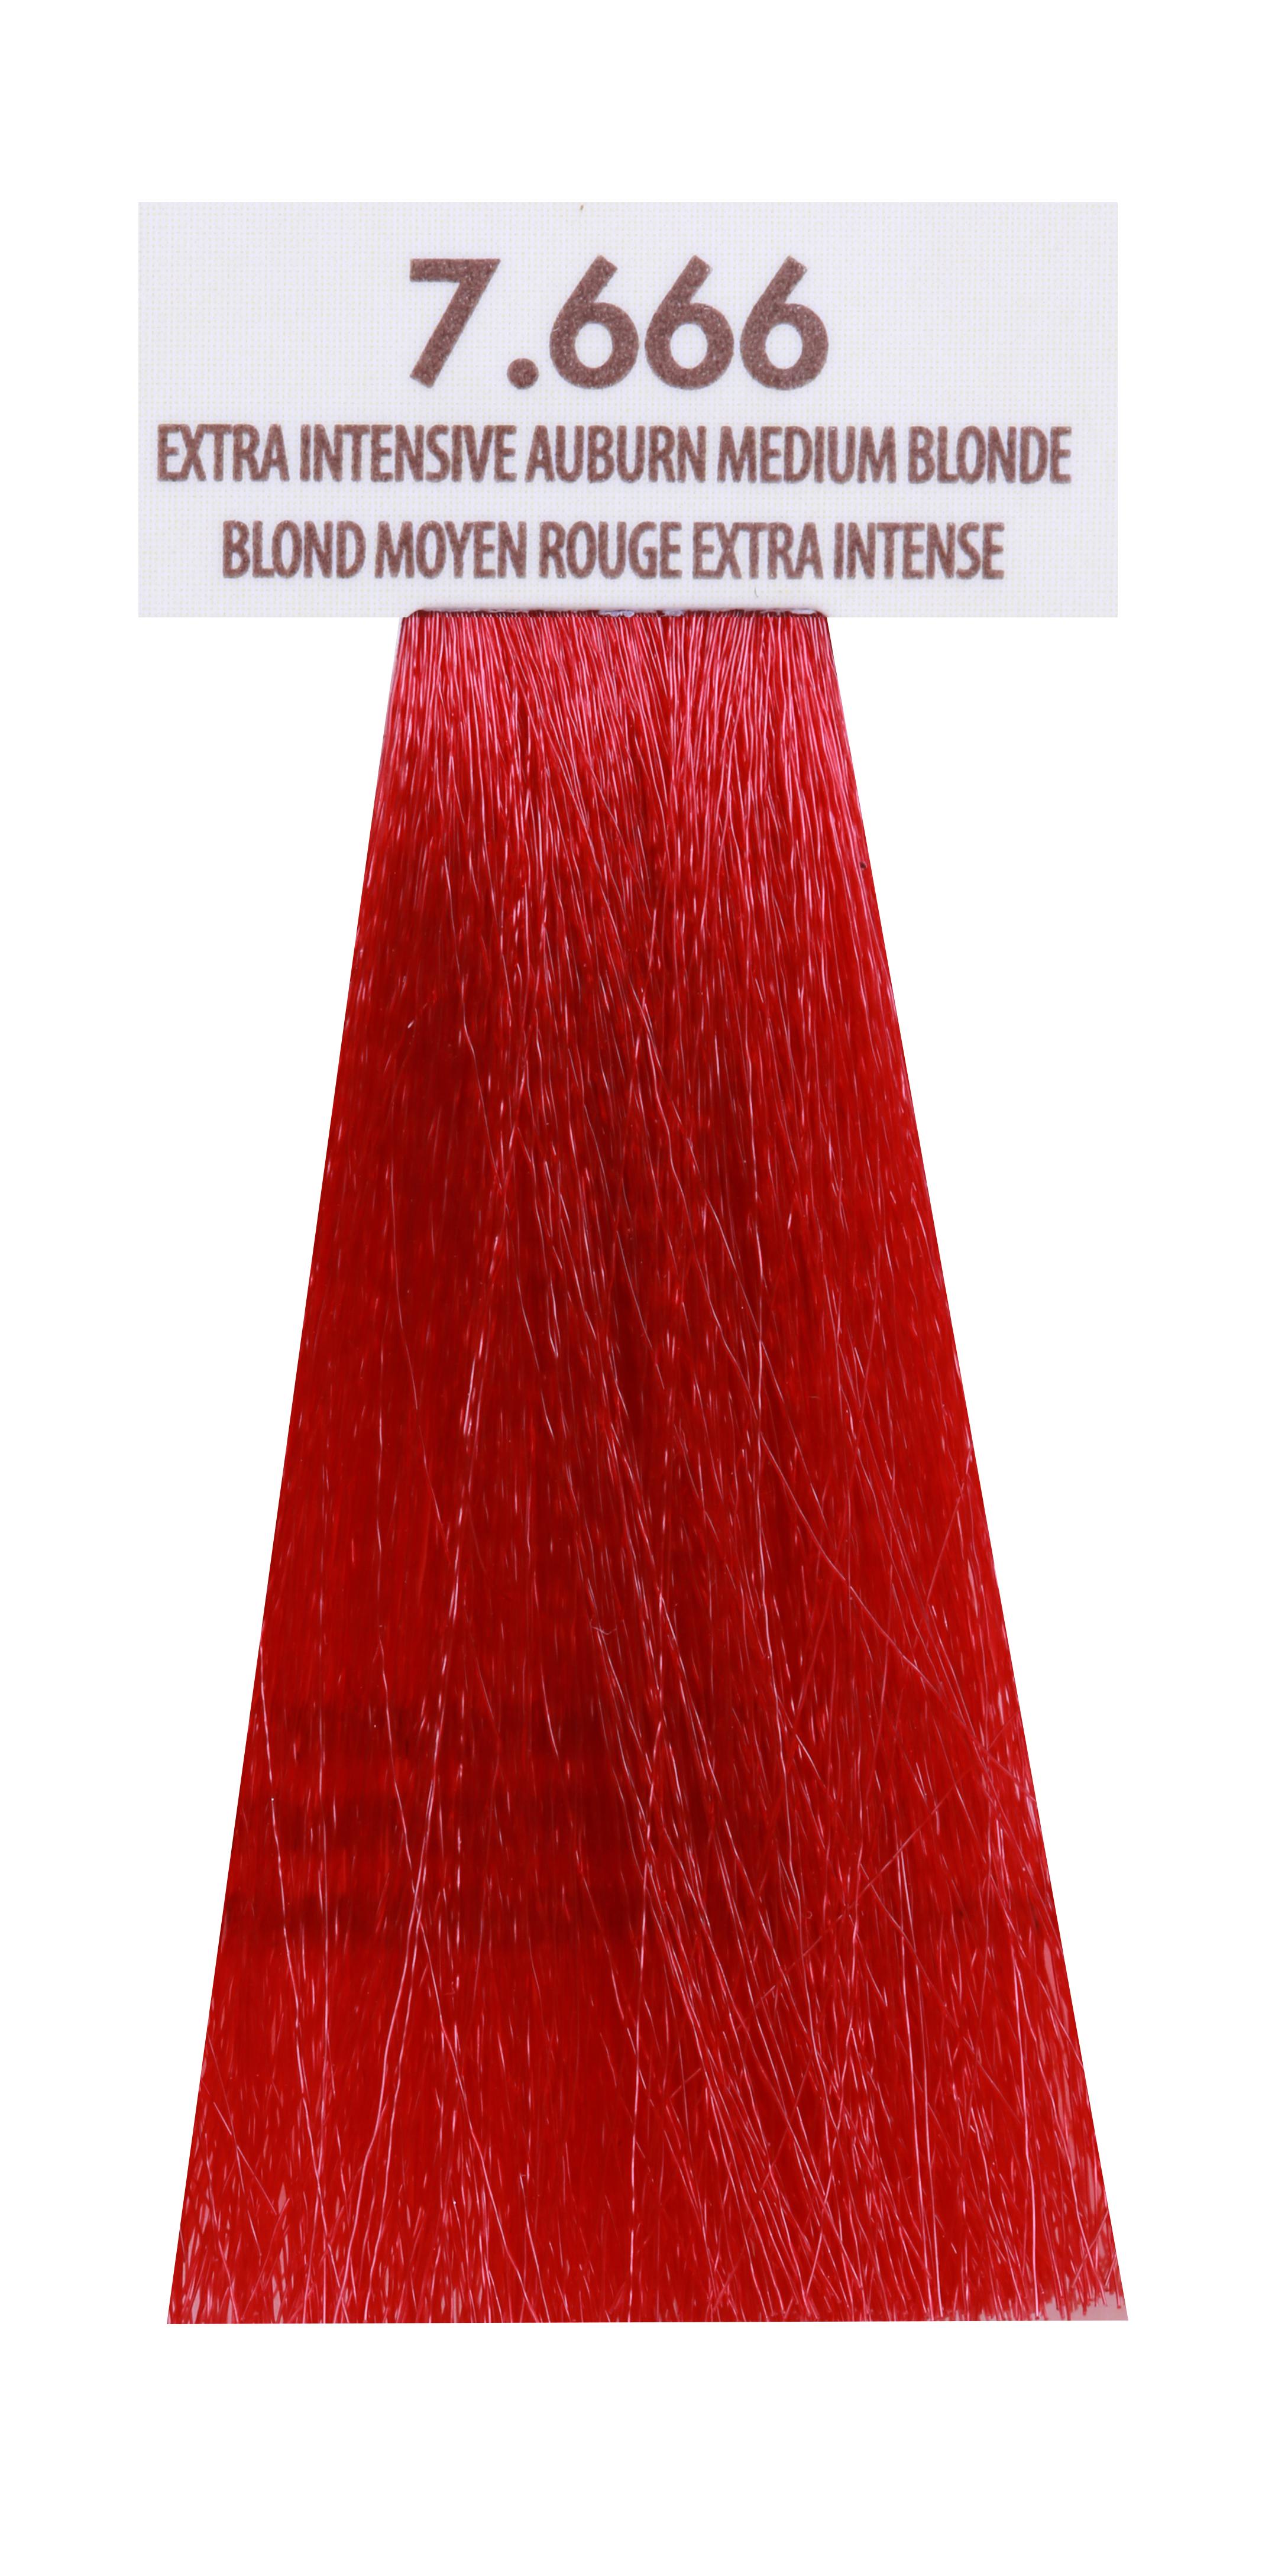 MACADAMIA NATURAL OIL 7.666 краска для волос, экстра яркий темно красный блондин / MACADAMIA COLORS 100 мл